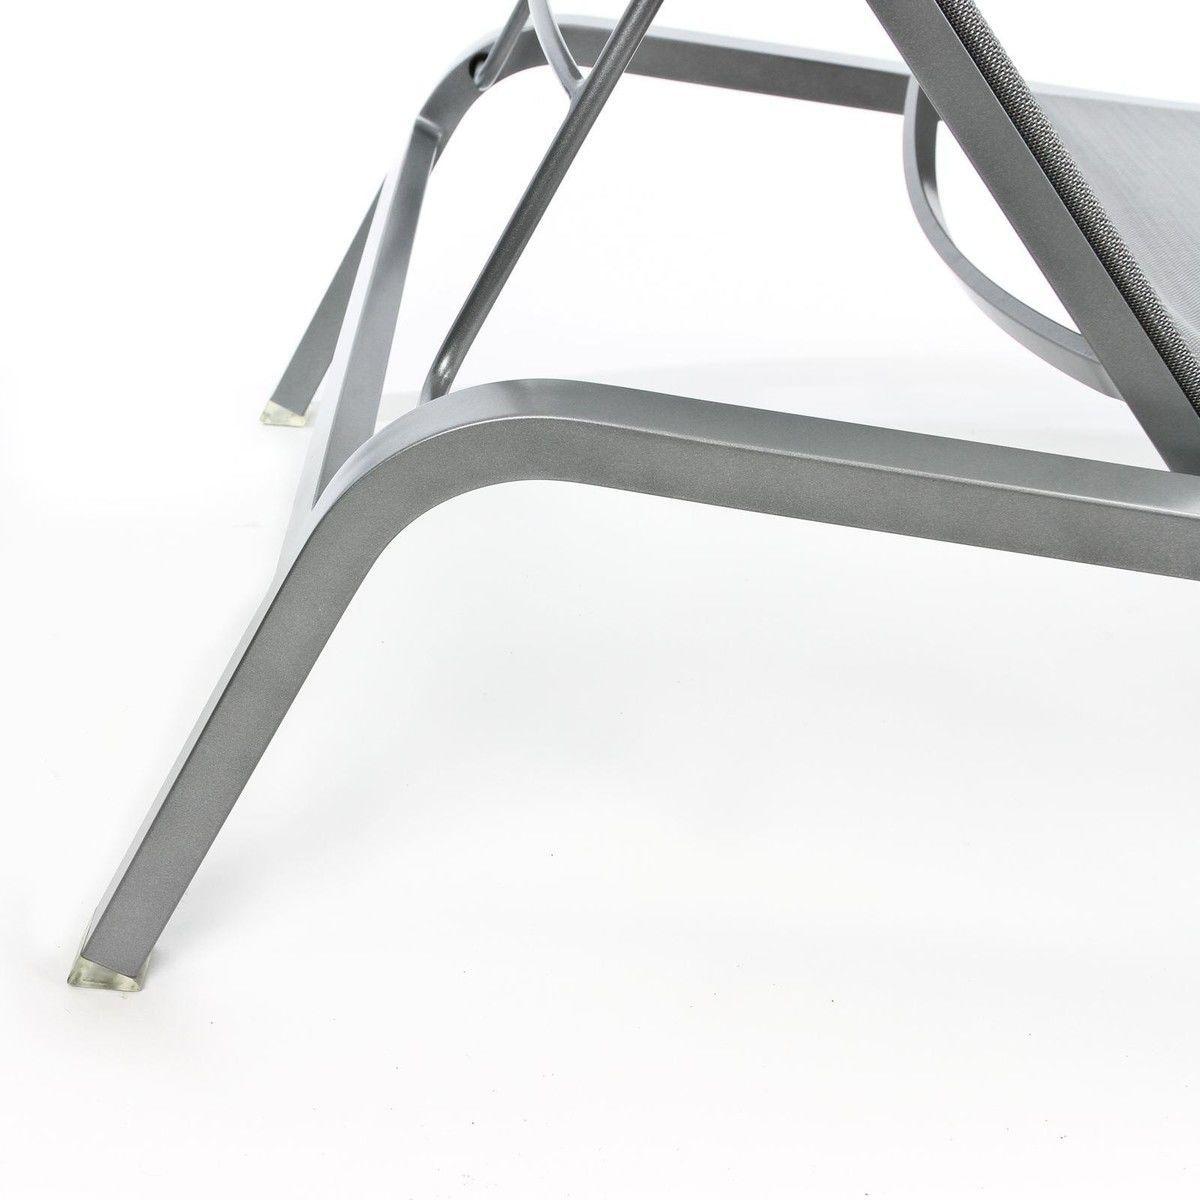 aliz xs bain de soleil fermob. Black Bedroom Furniture Sets. Home Design Ideas